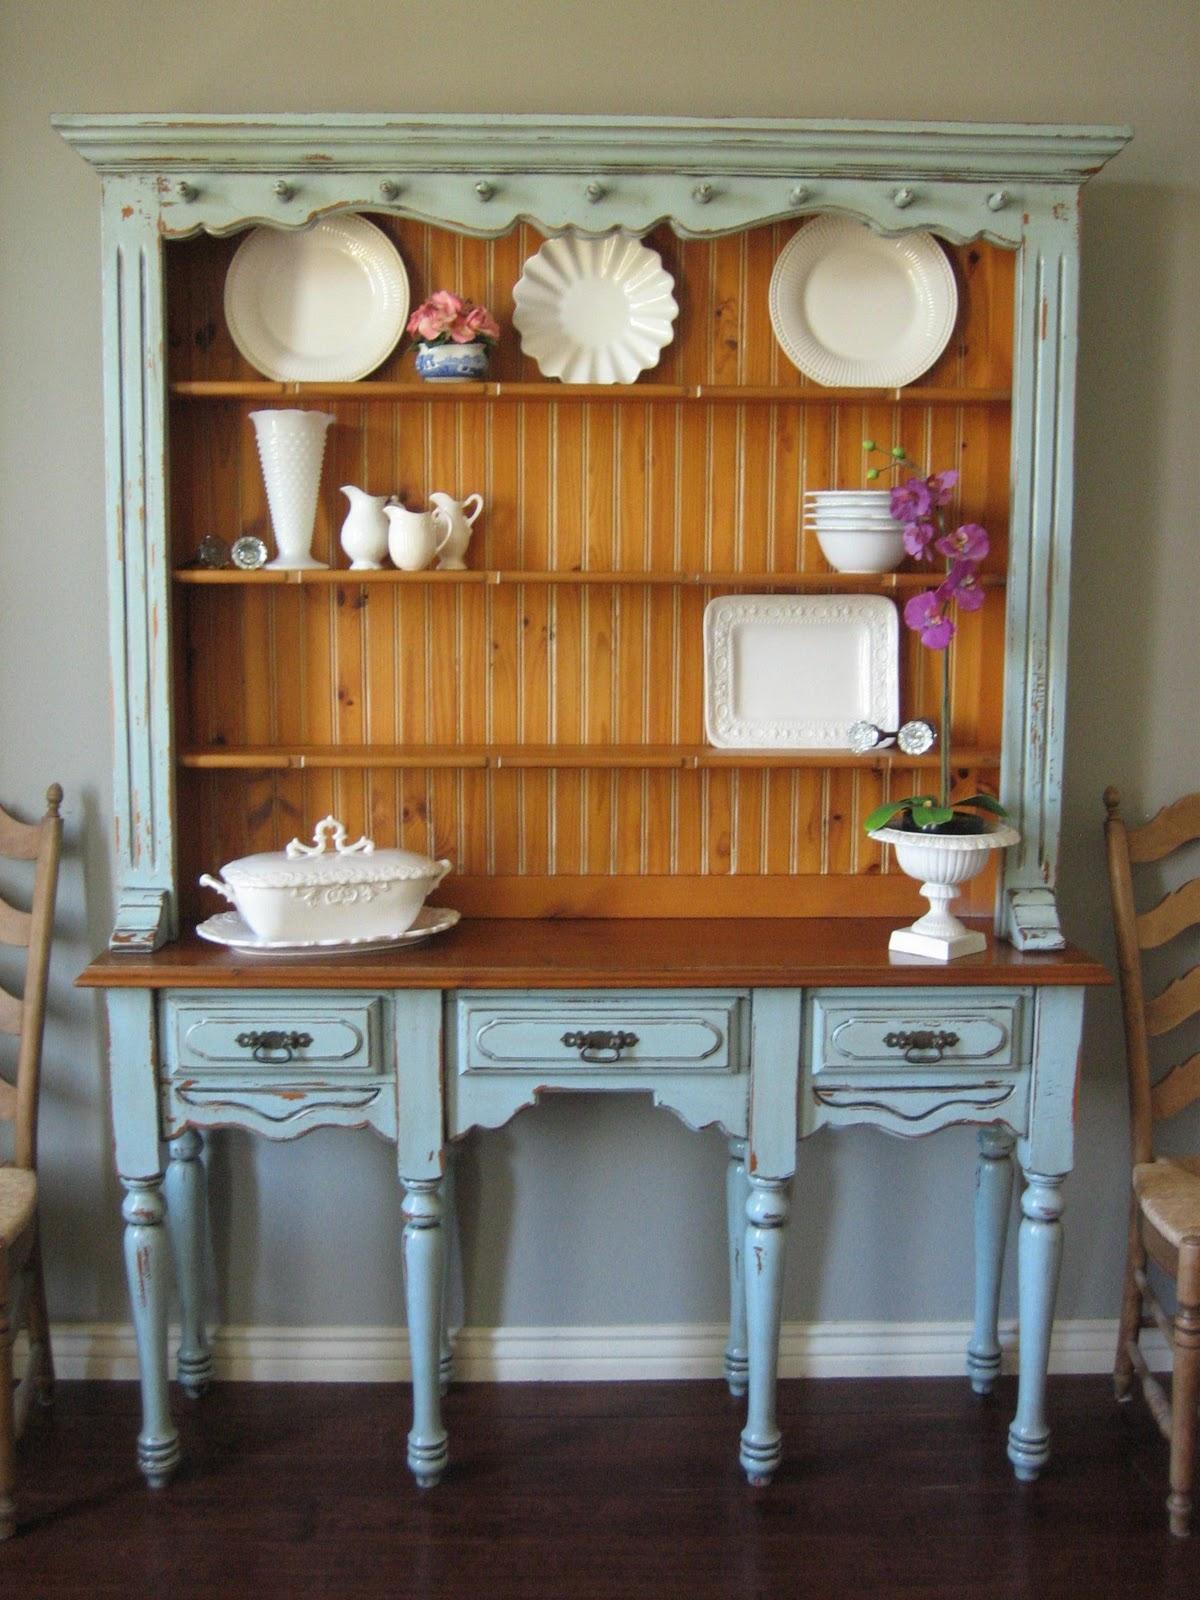 The amazing Beadboard kitchen backsplash farmhouse photo